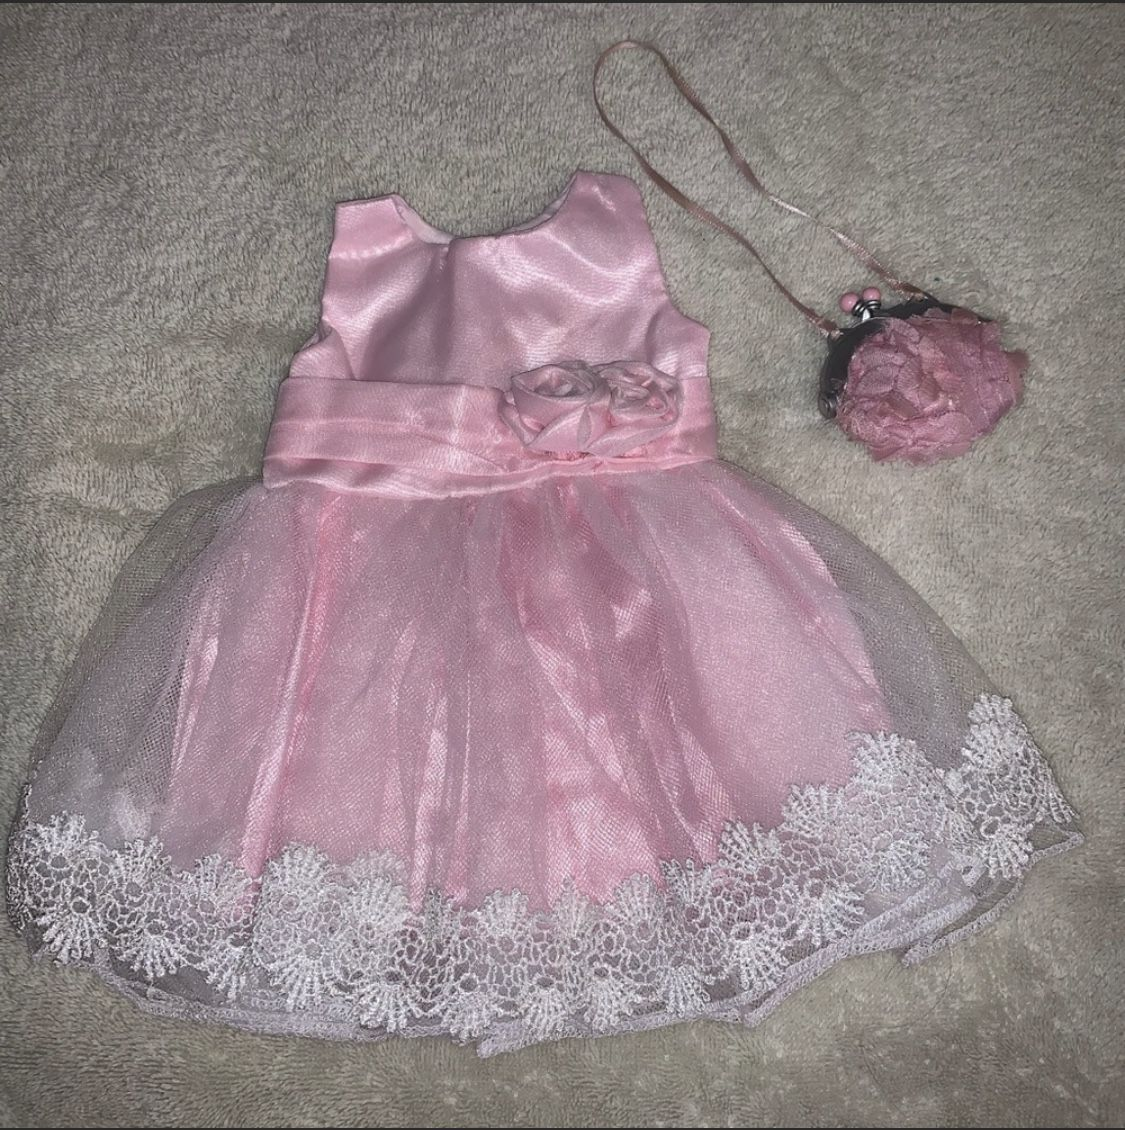 Doll wedding dress set